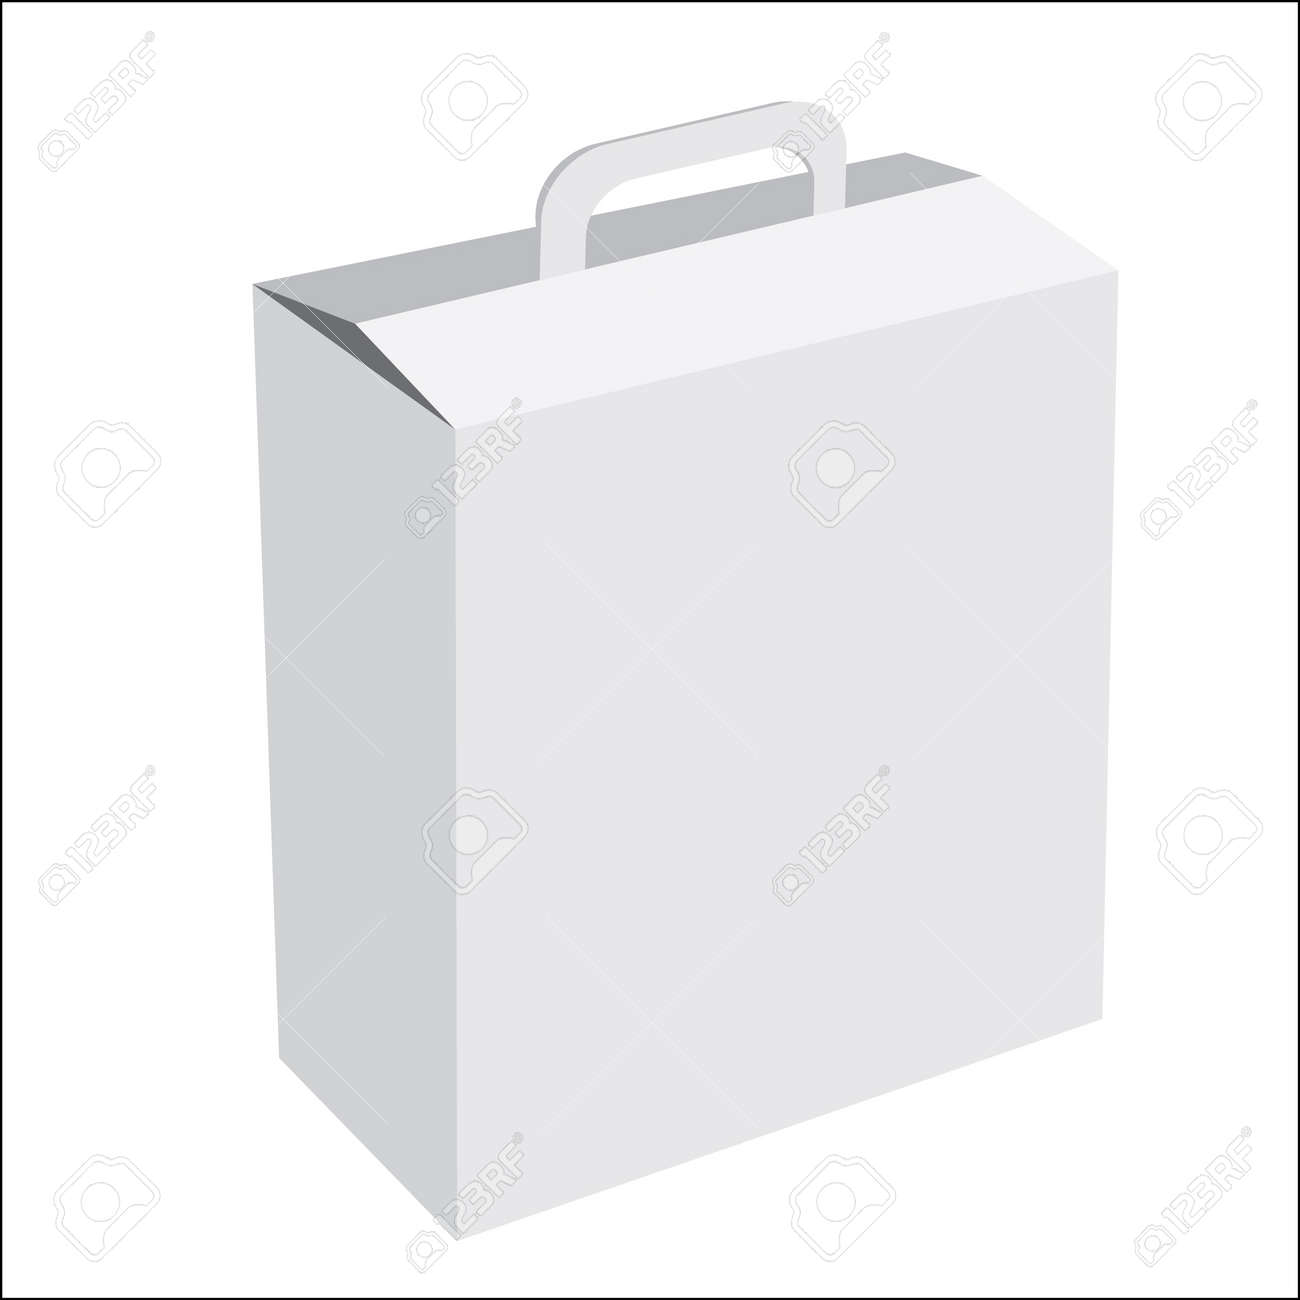 Carton Box Graphic - 156506680